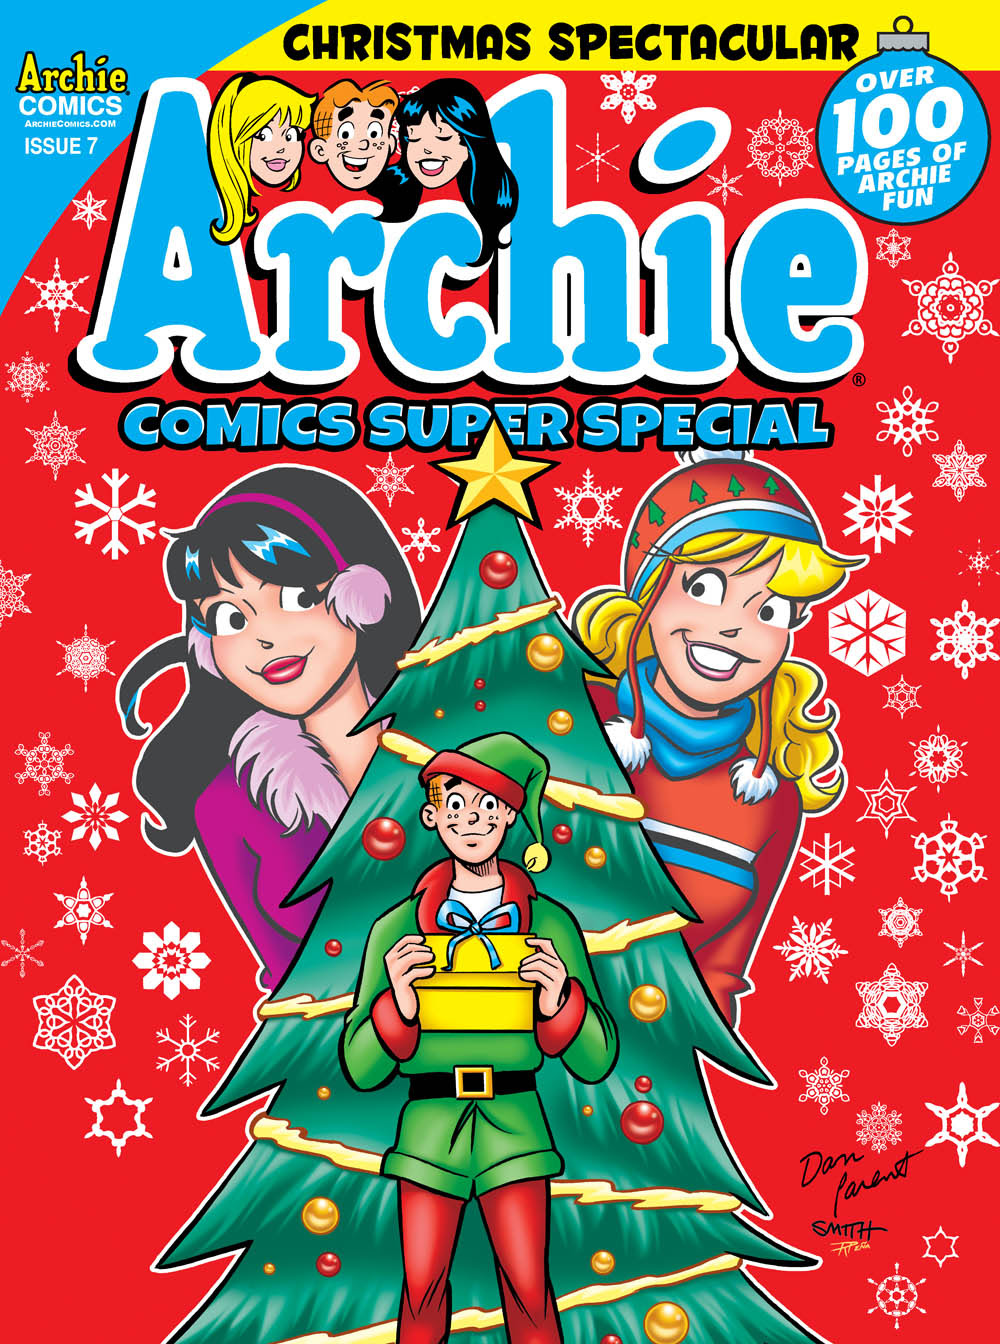 Archie Comics Super Special #7 Cover